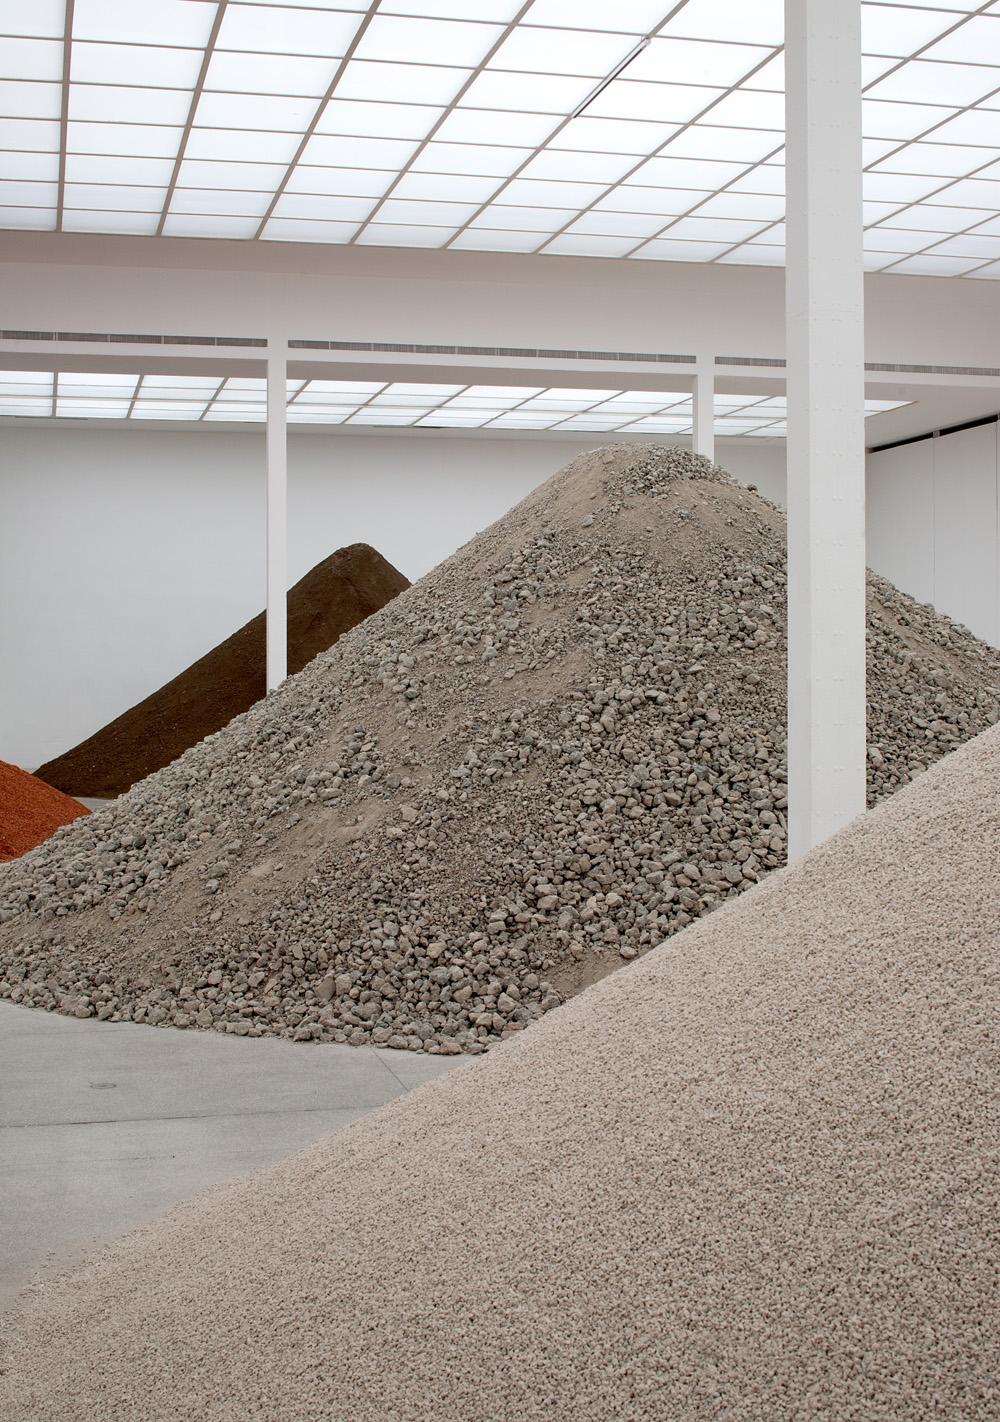 Lara Almarcegui, Secession, Art, installation, inspiration, oracle fox